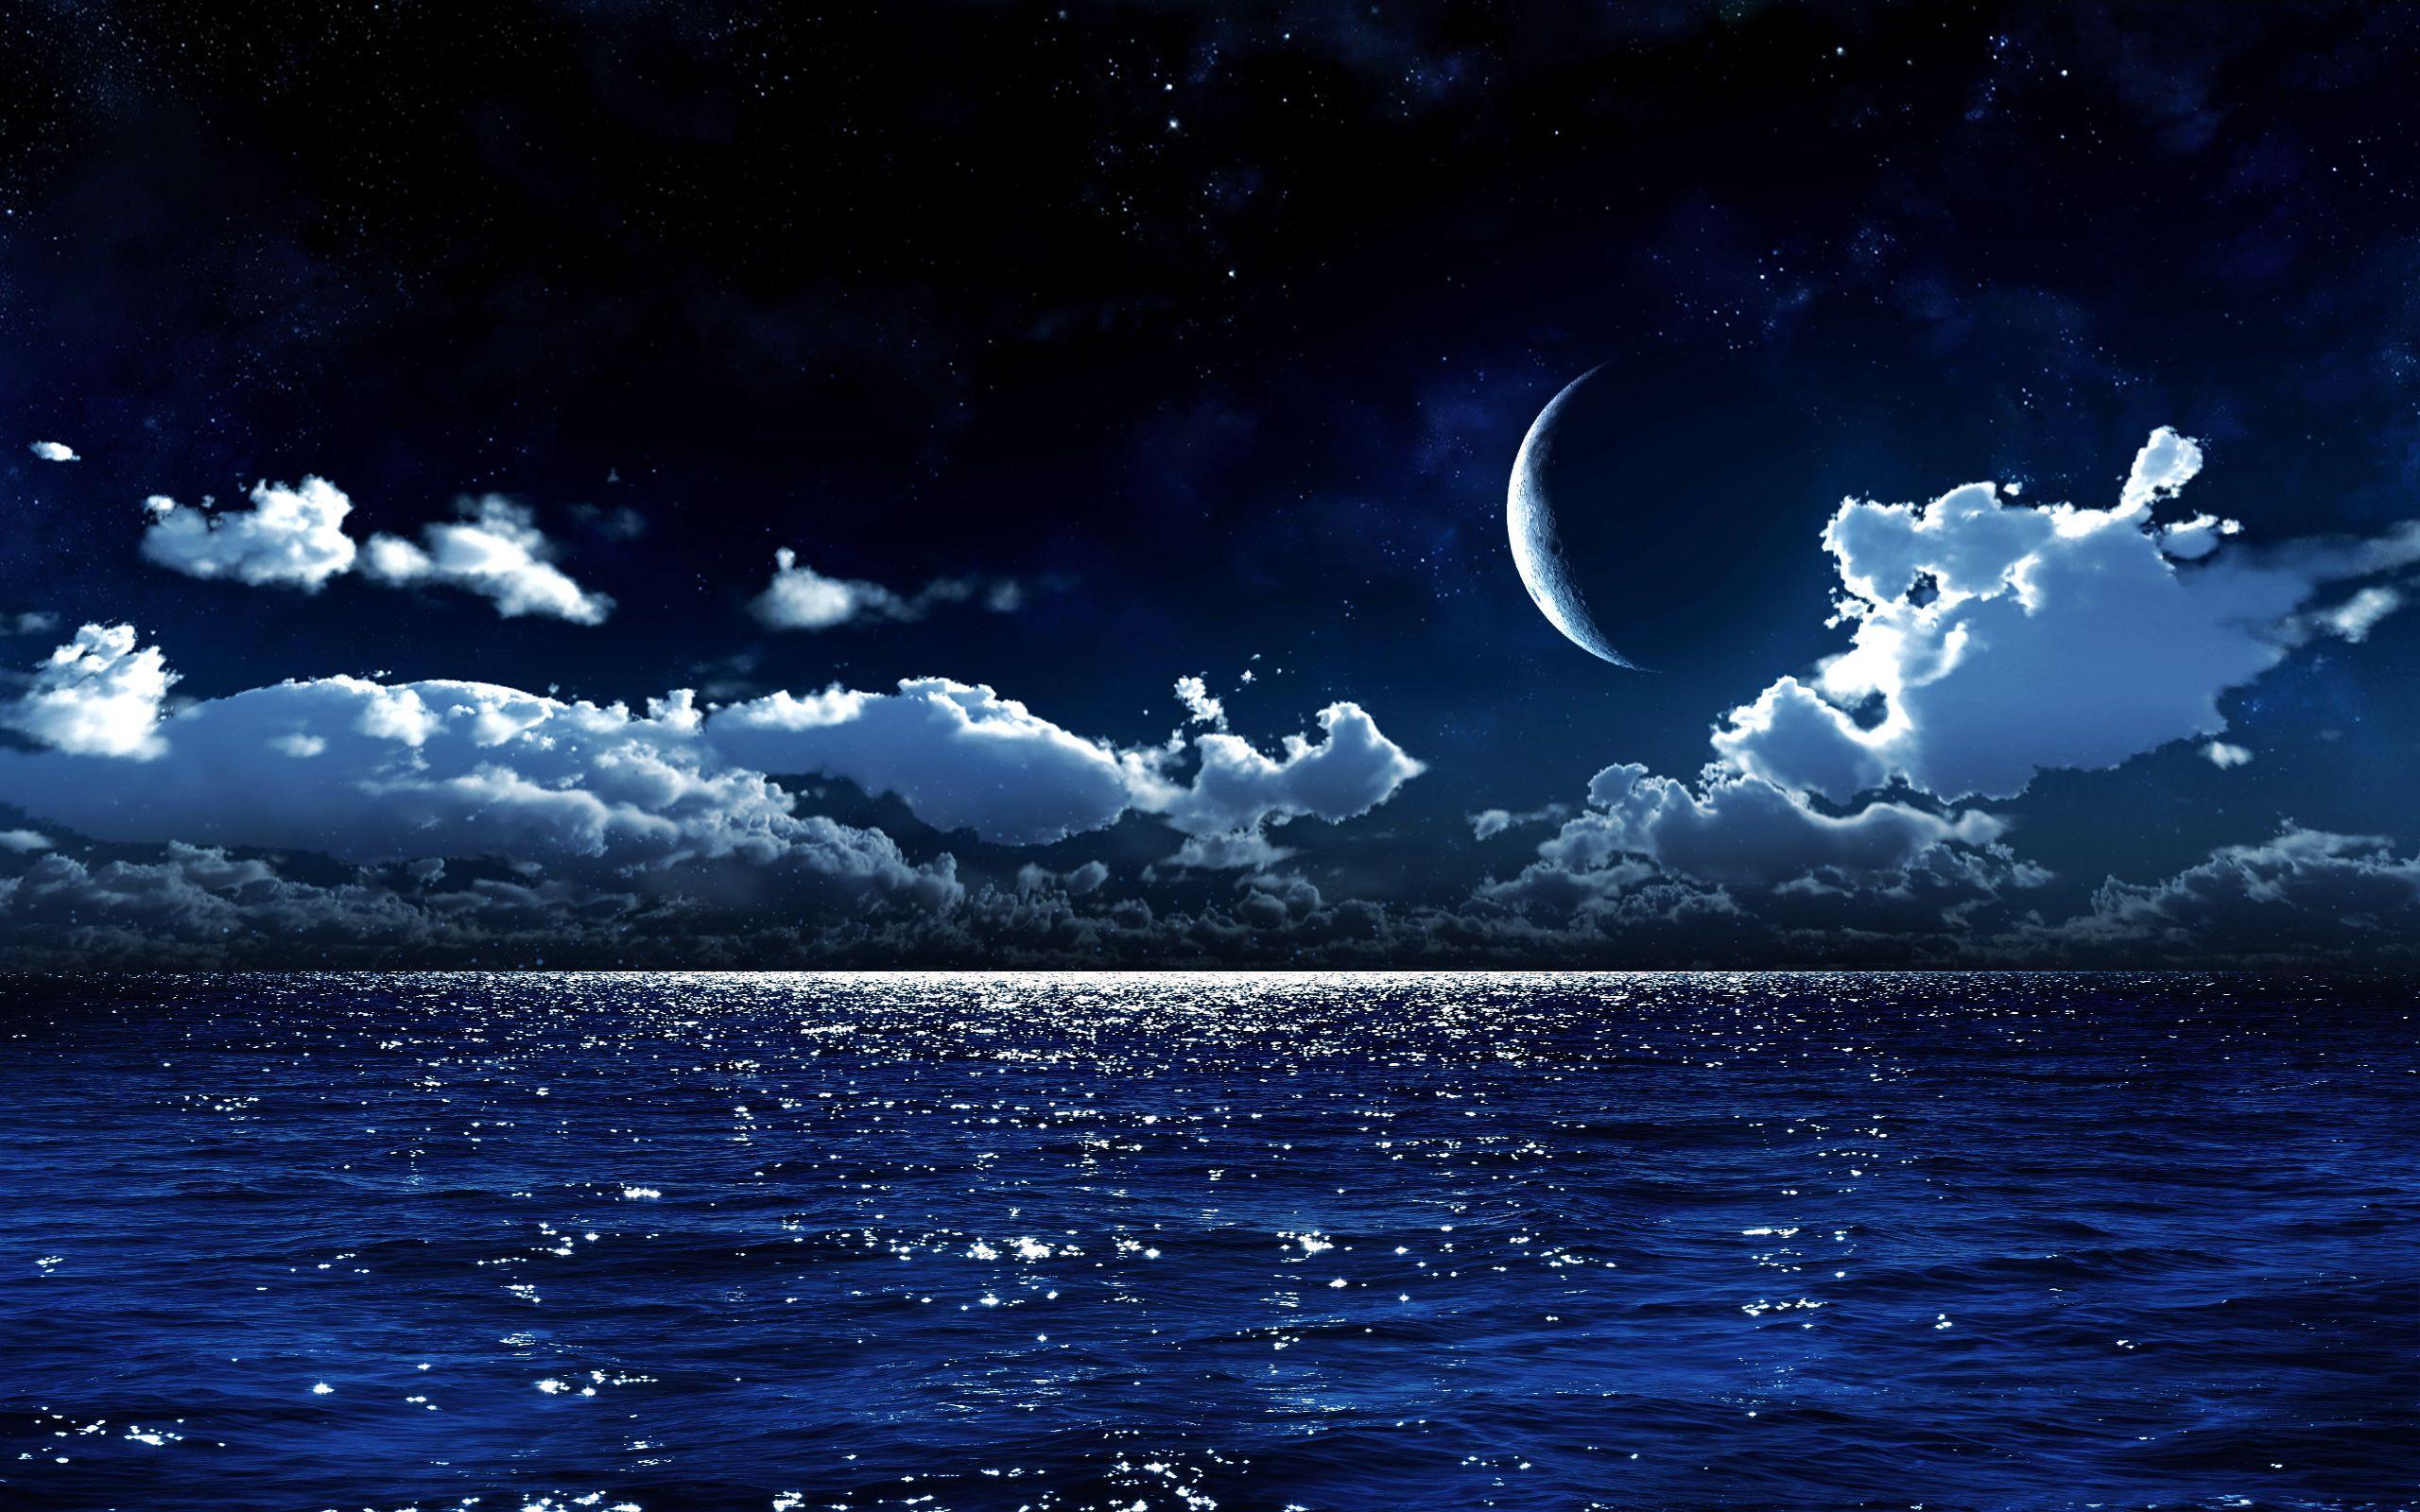 картинка ночное море и звезды